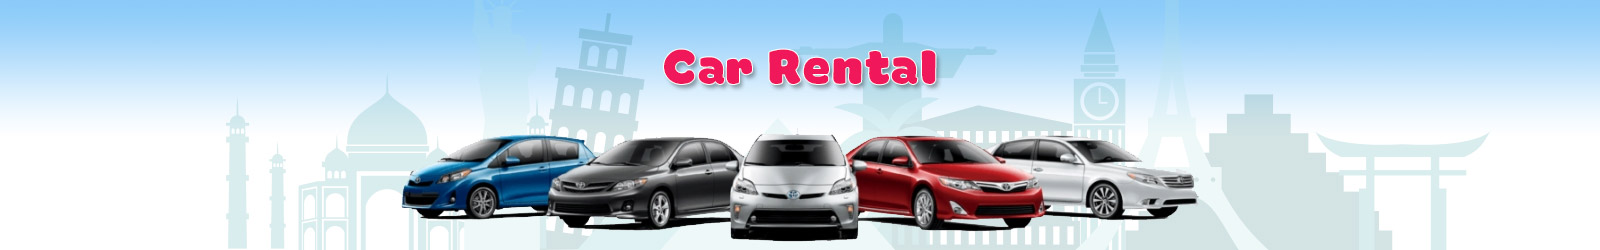 banner-car-rental